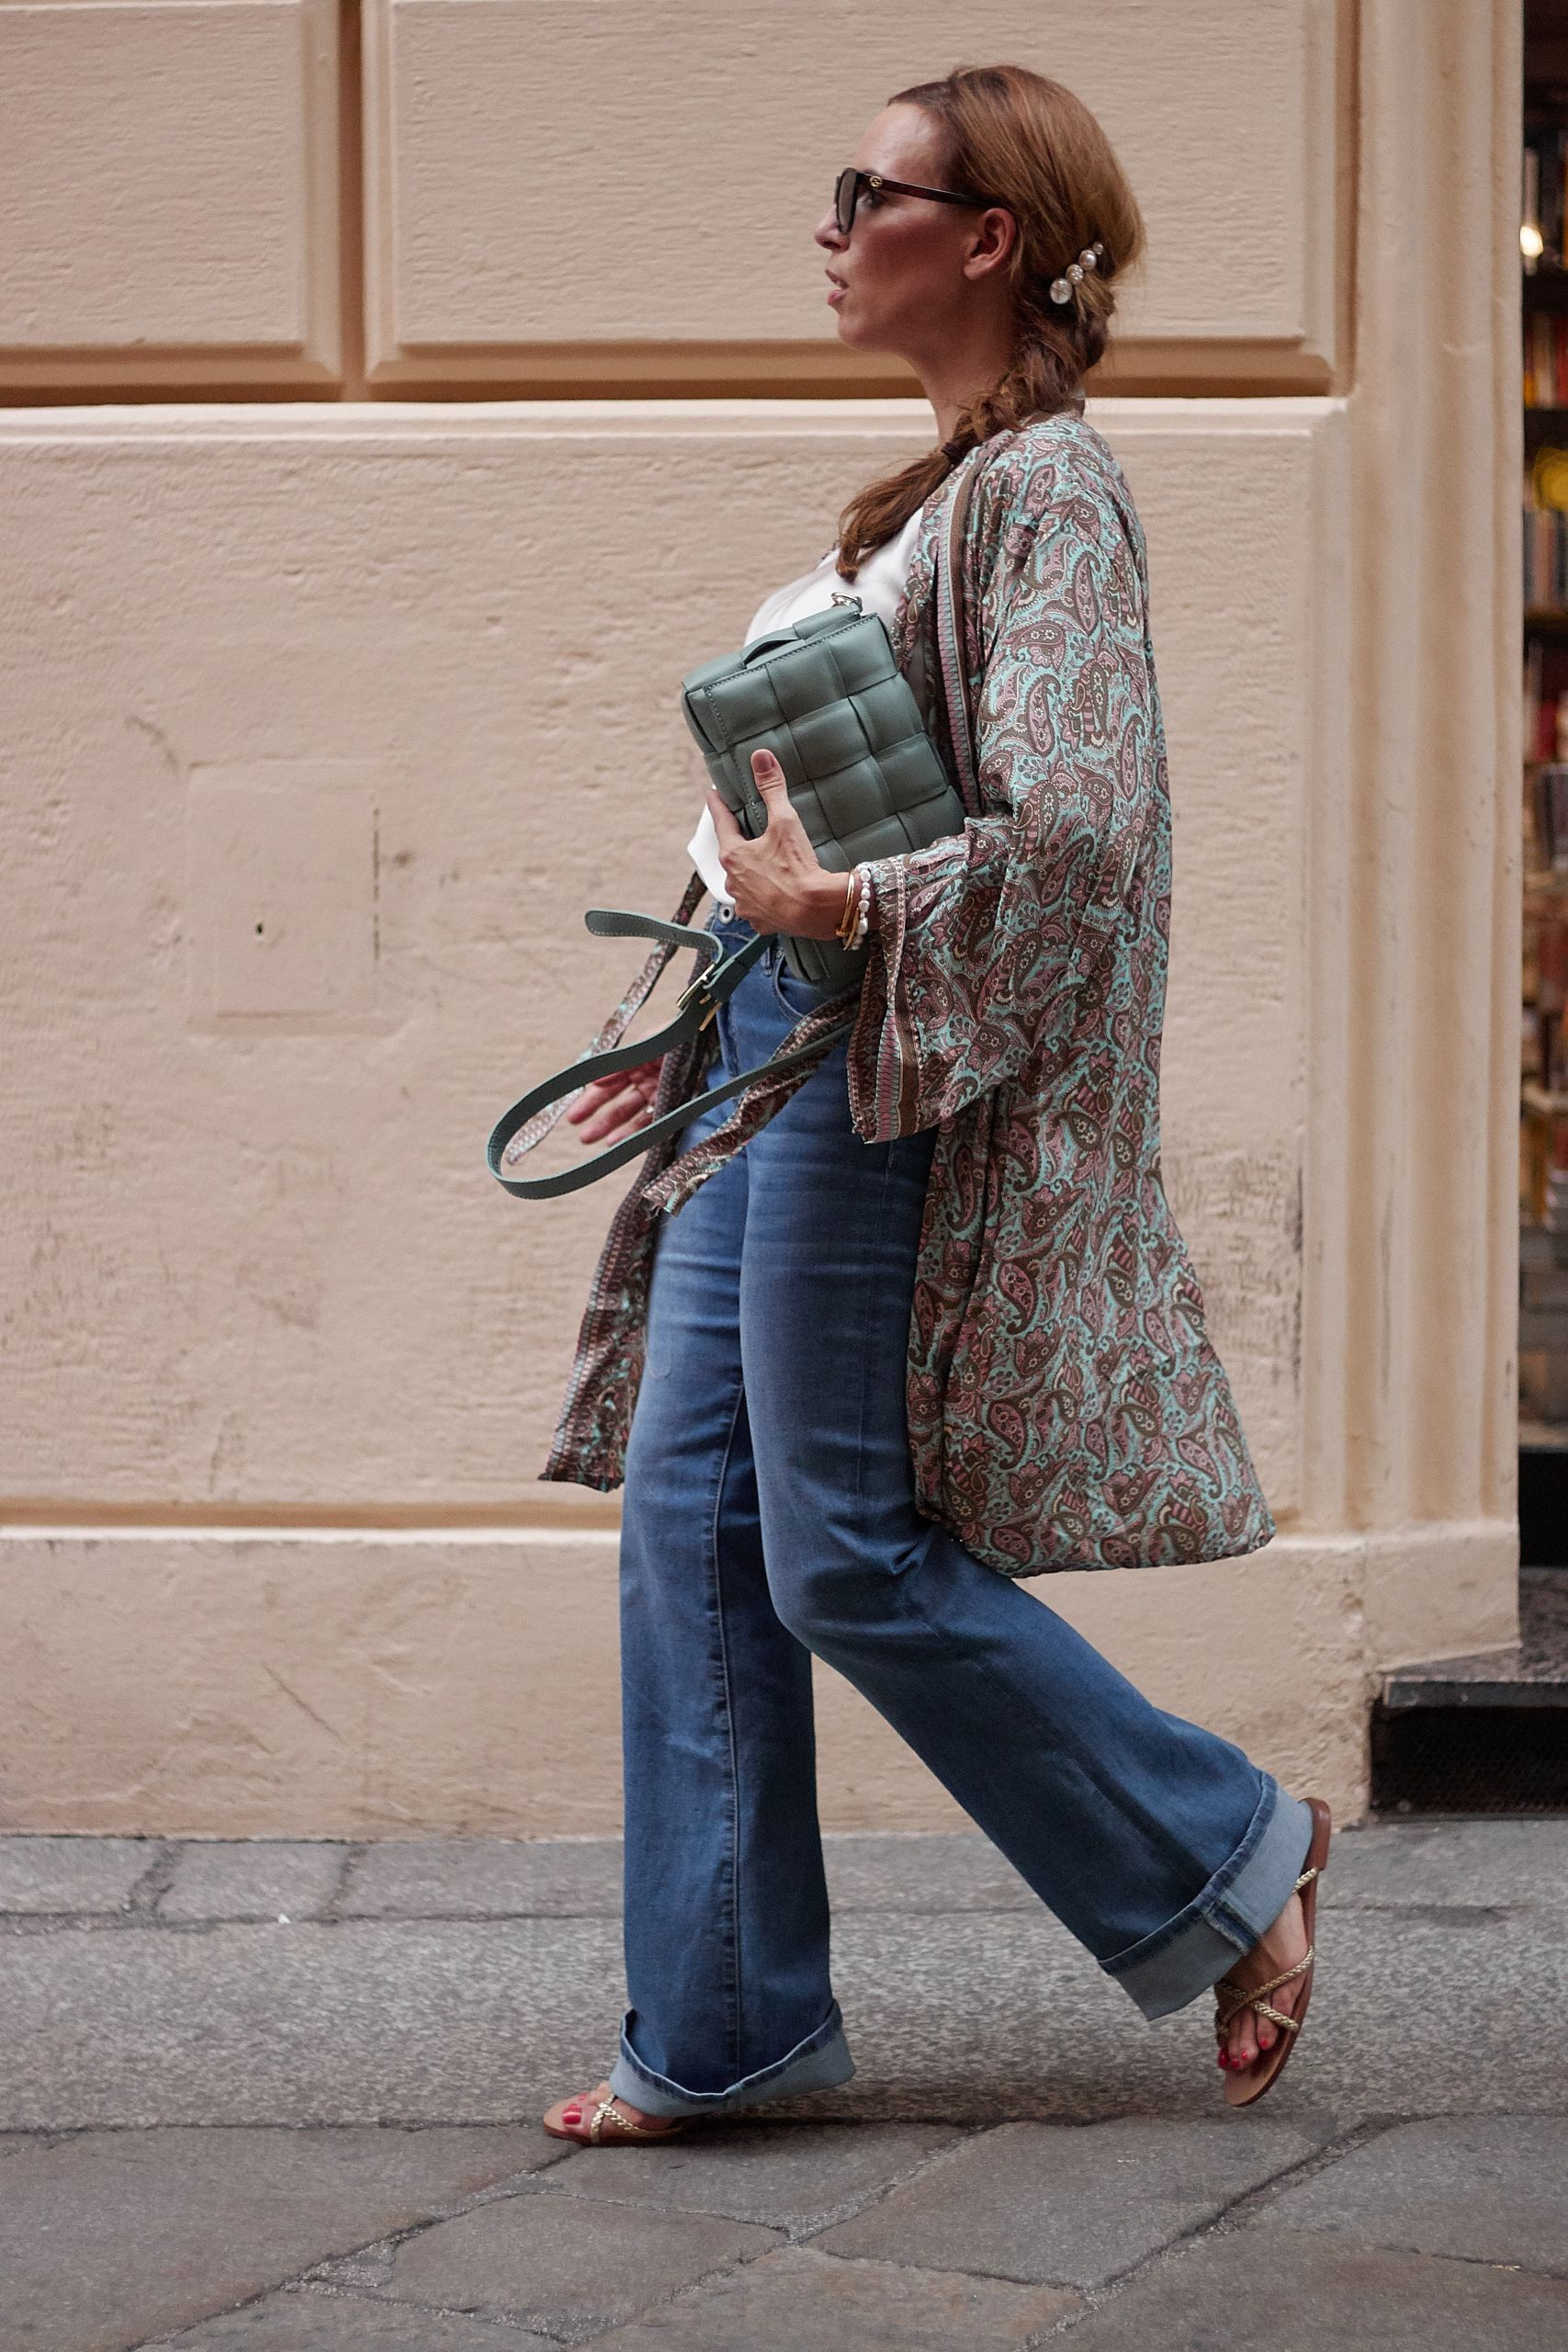 Settimo Cielo Bologna Kimono zu Flared Jeans und Ledertasche und Sonnenbrille von Optiker Bode